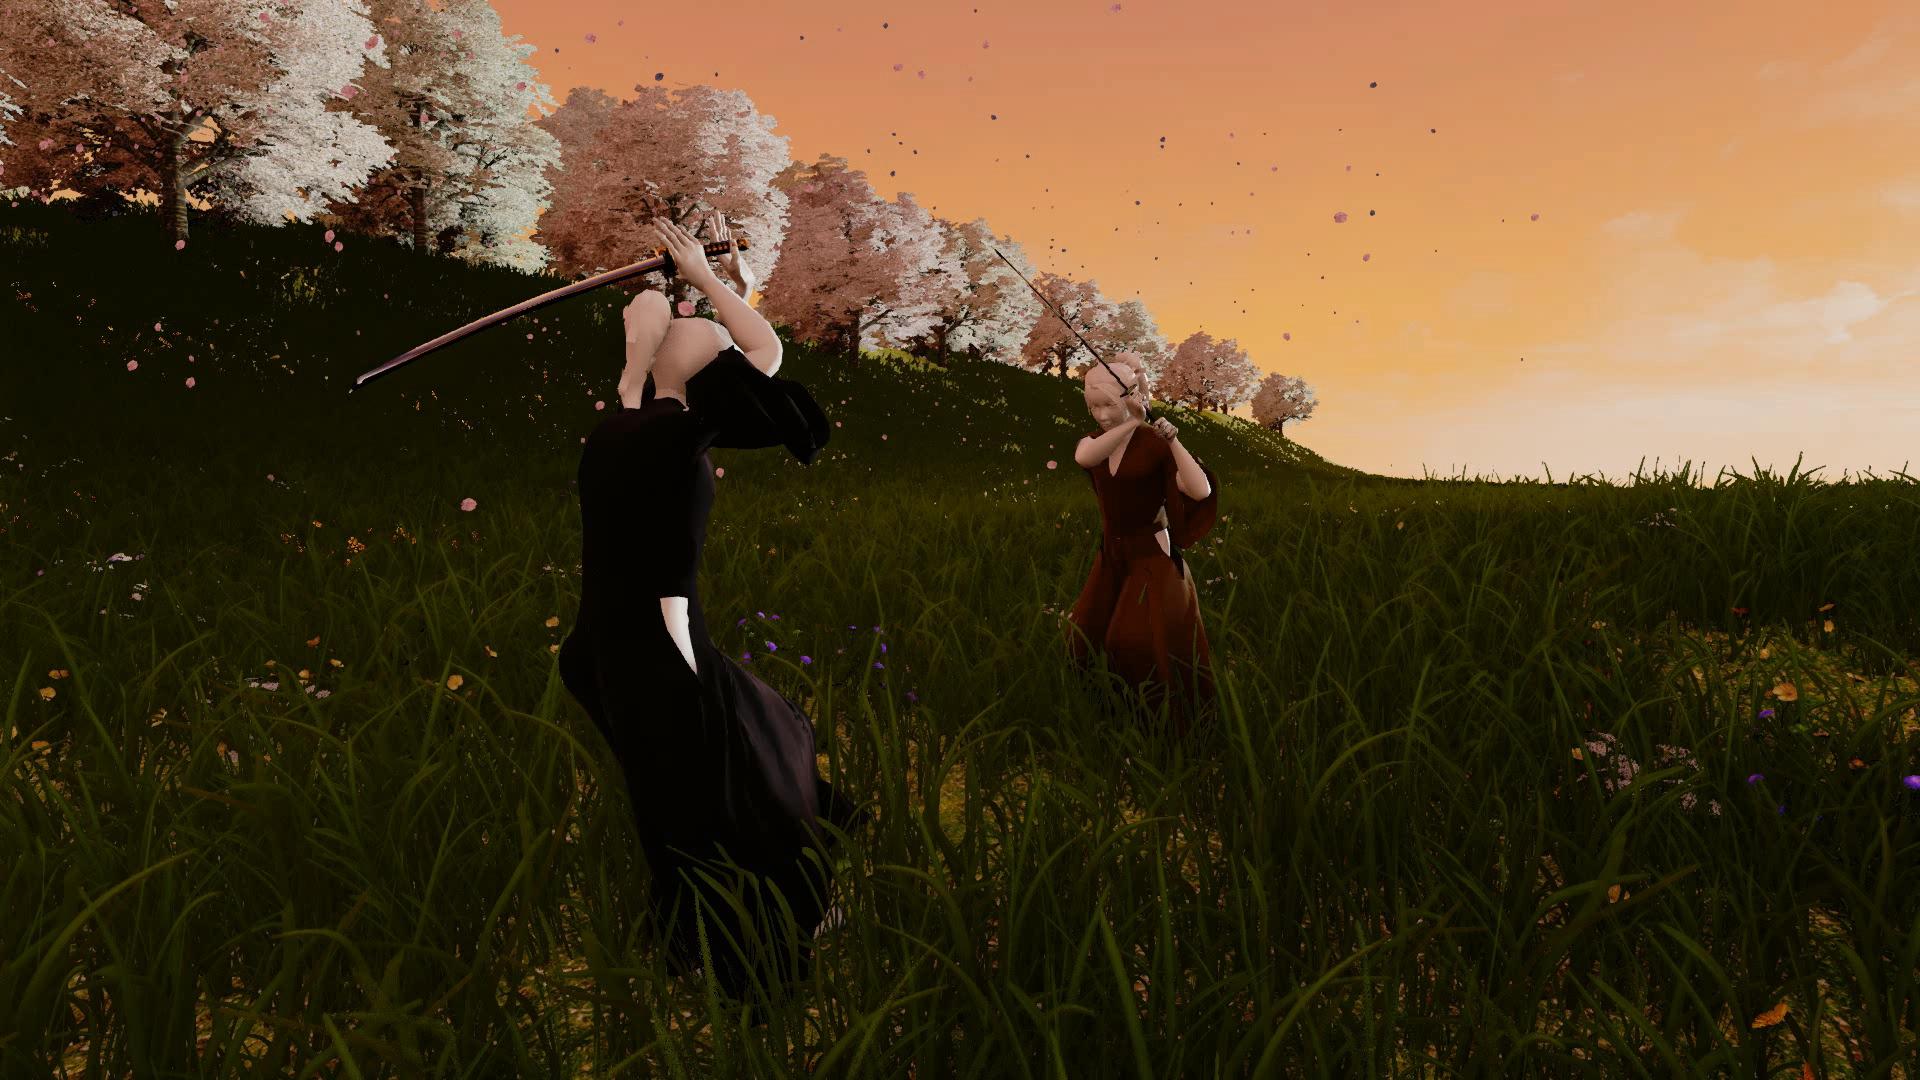 Анонсирован Hatashiai — реалистичный самурайский файтинг на Unreal Engine 4